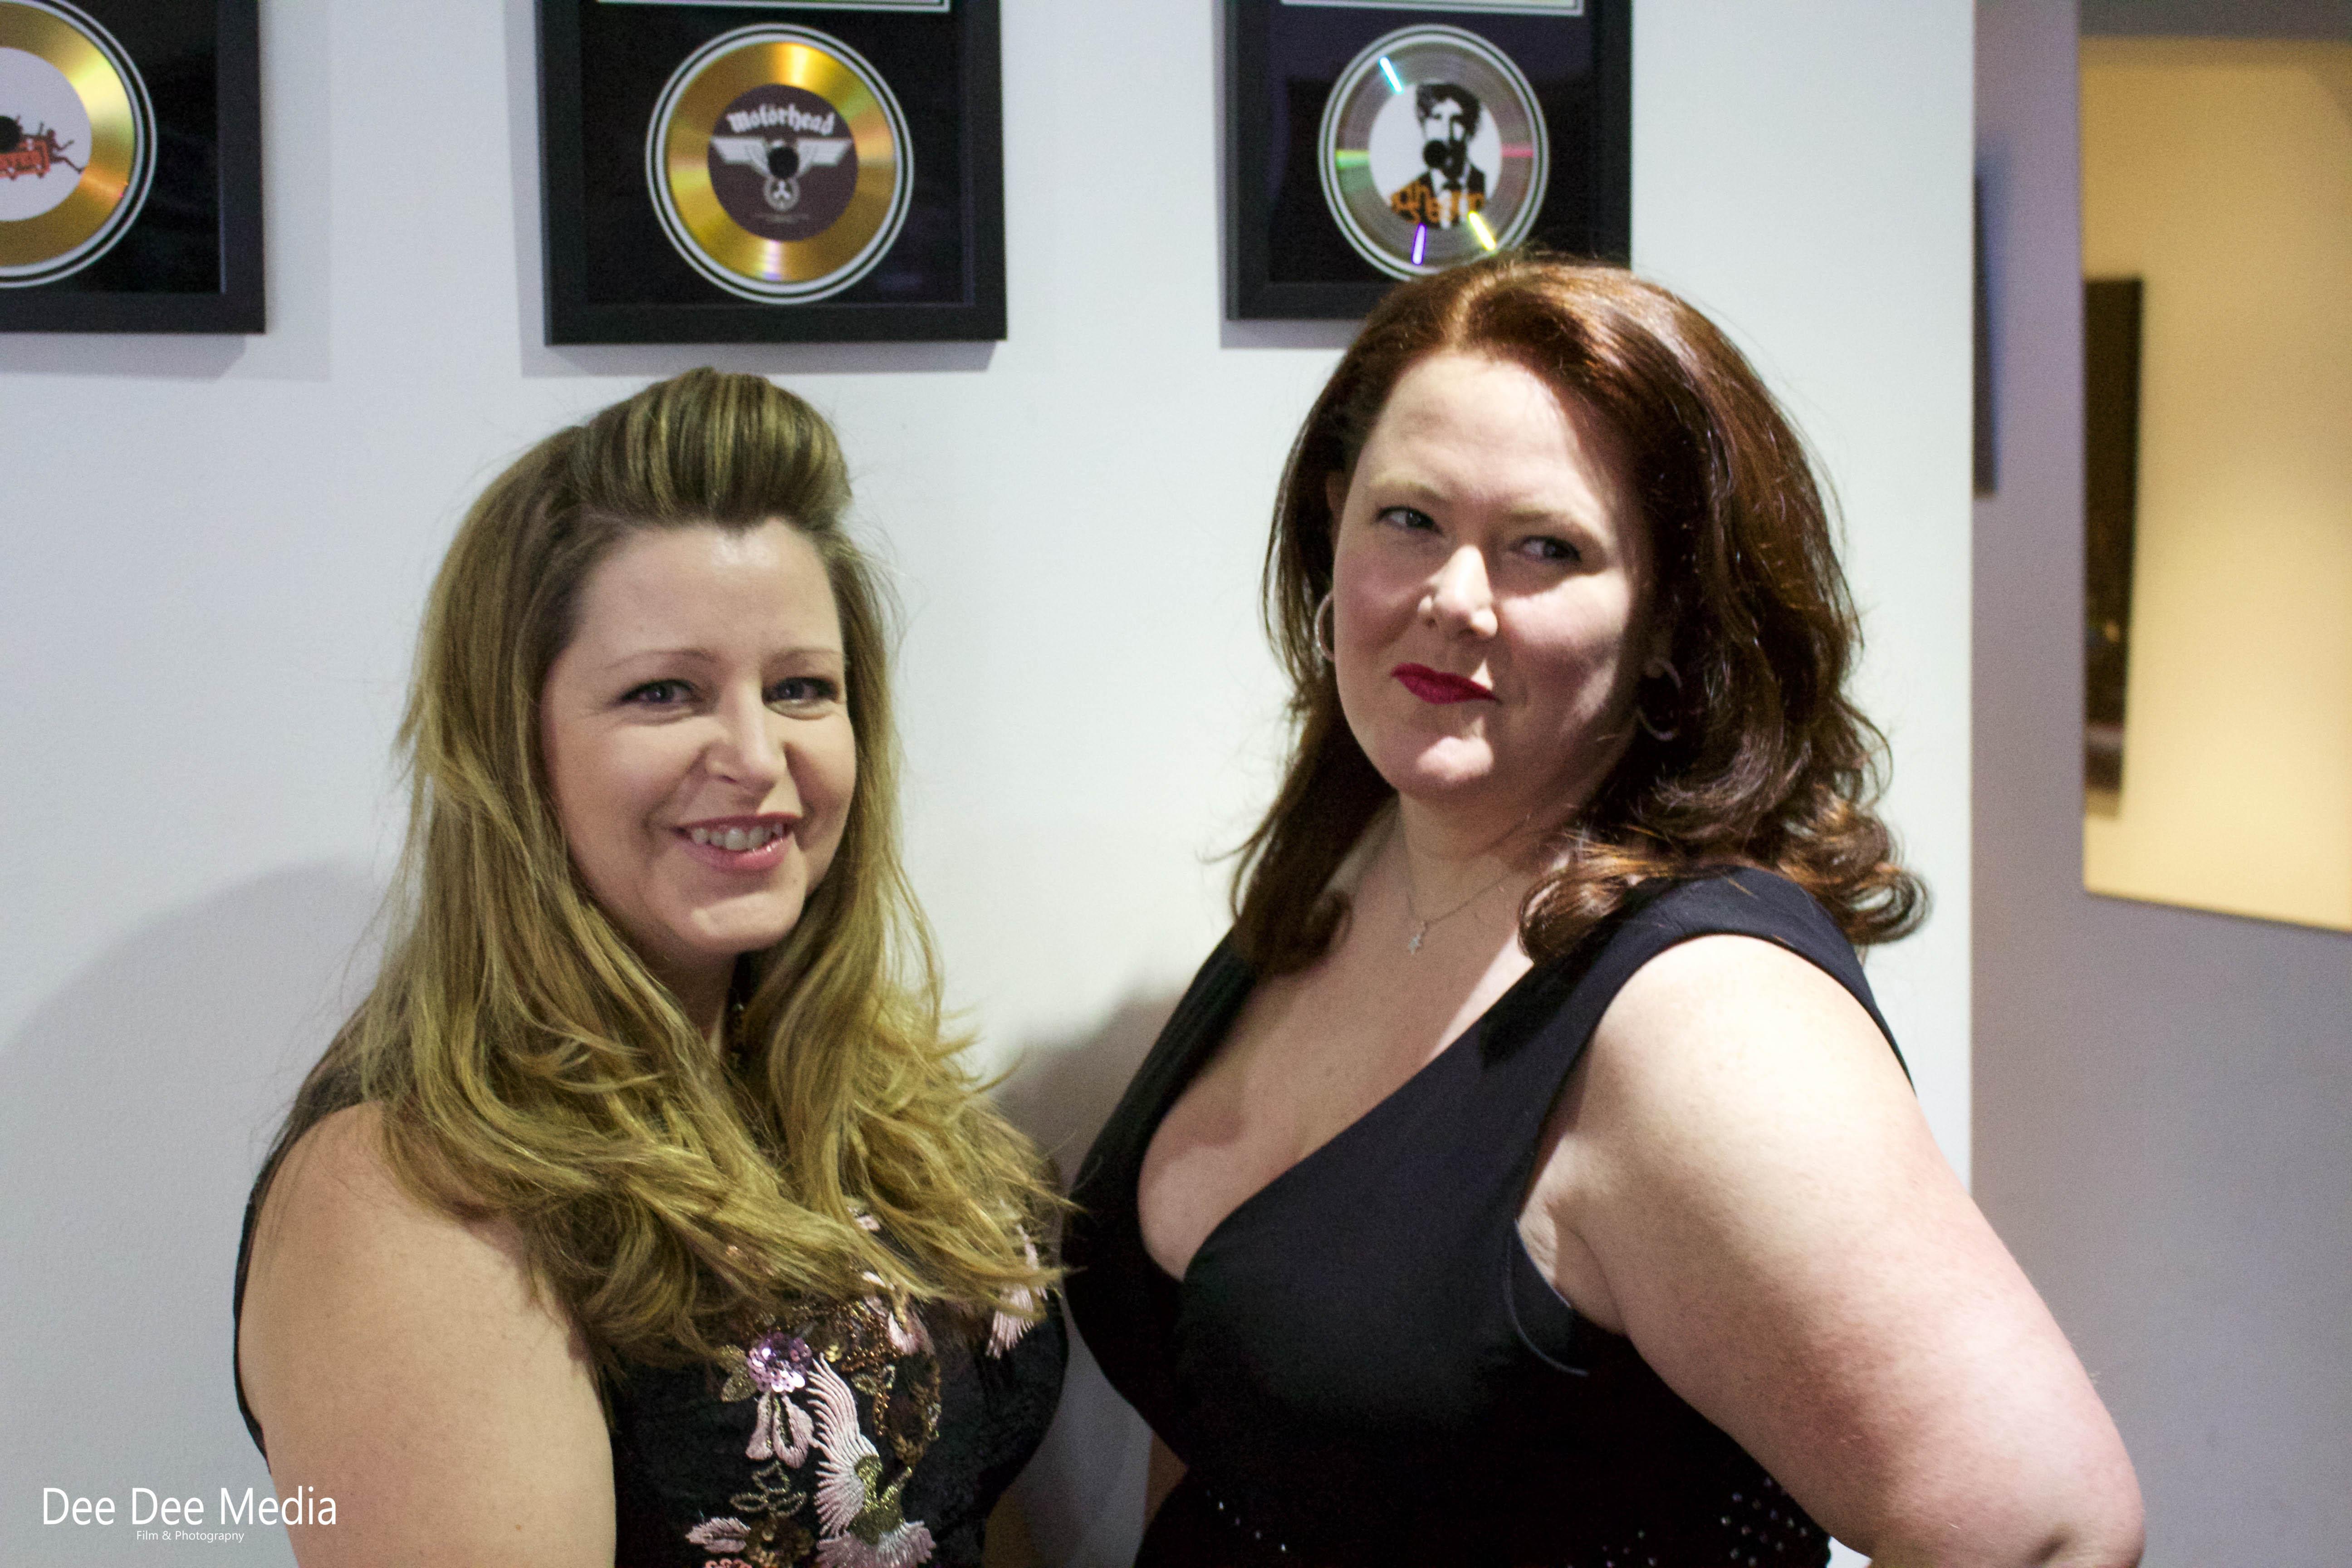 Female Vocalist's